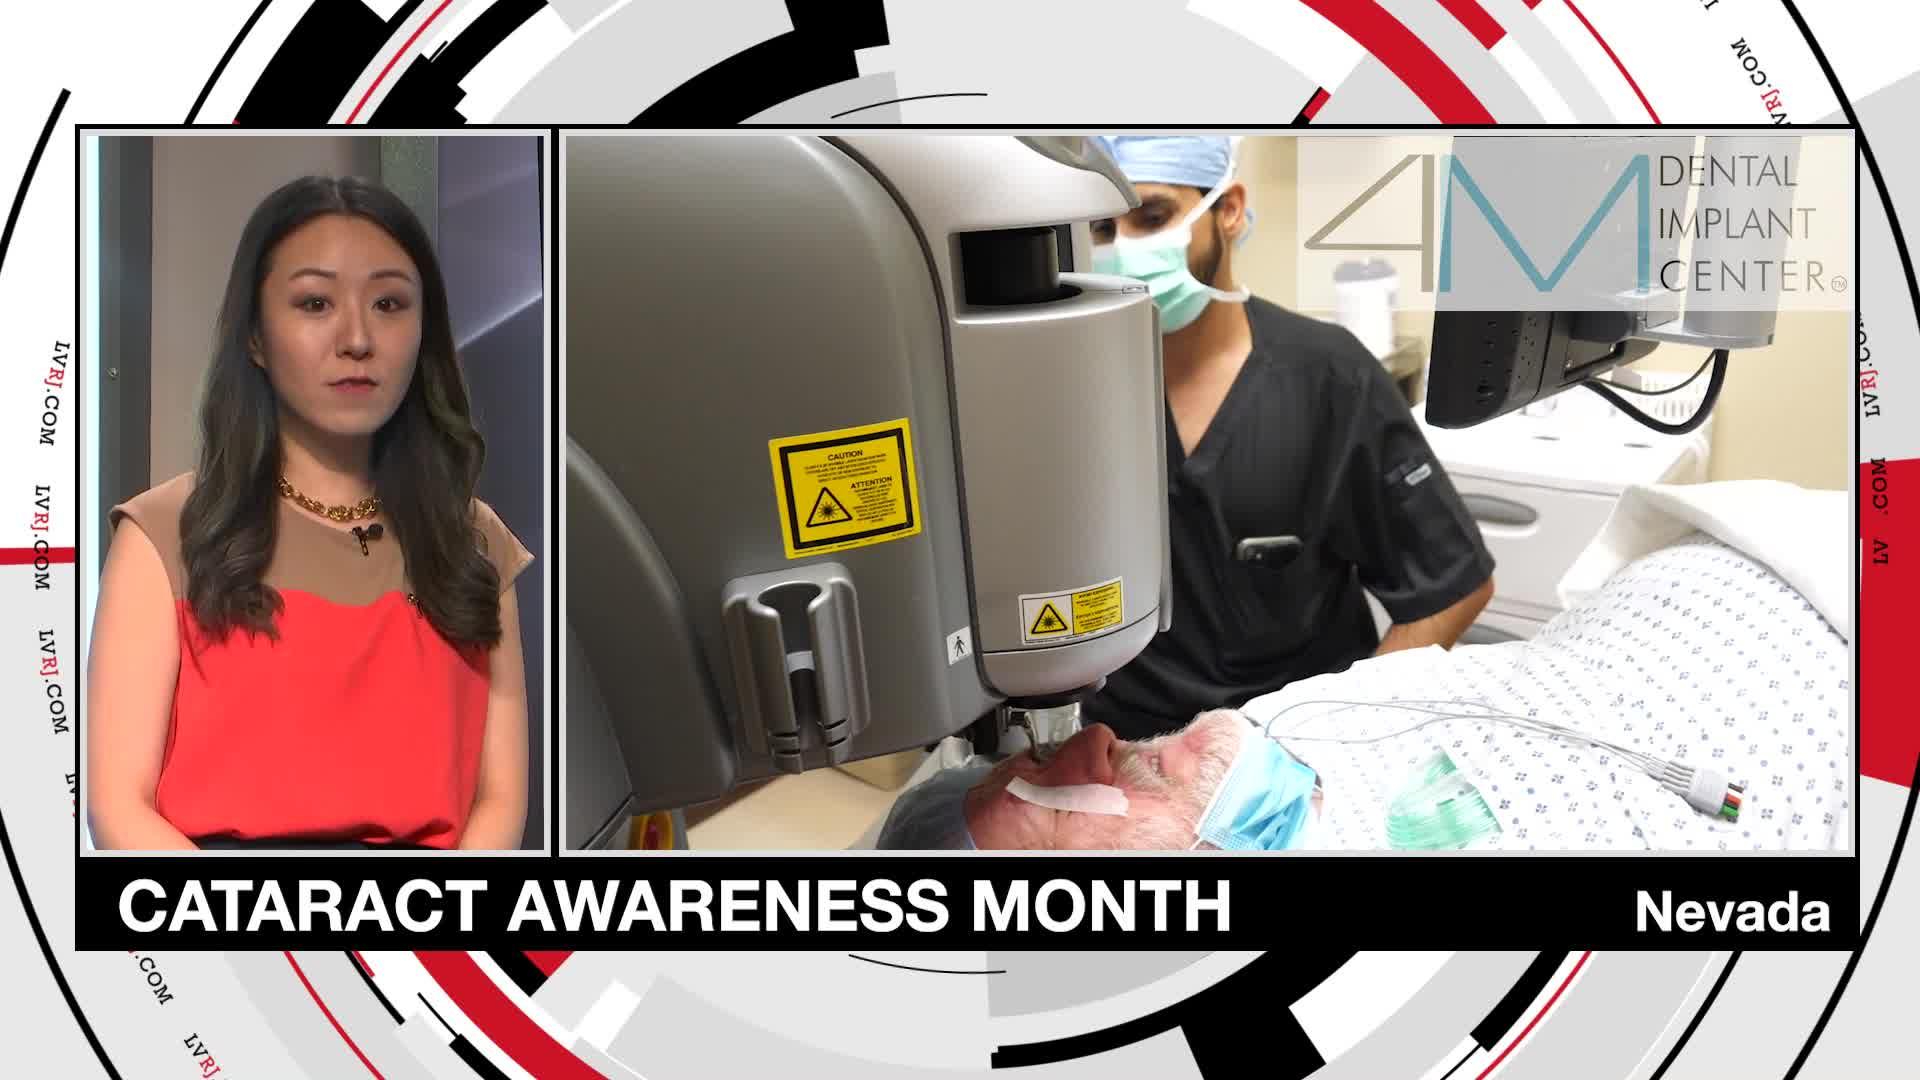 7@7PM Cataract Awareness Month